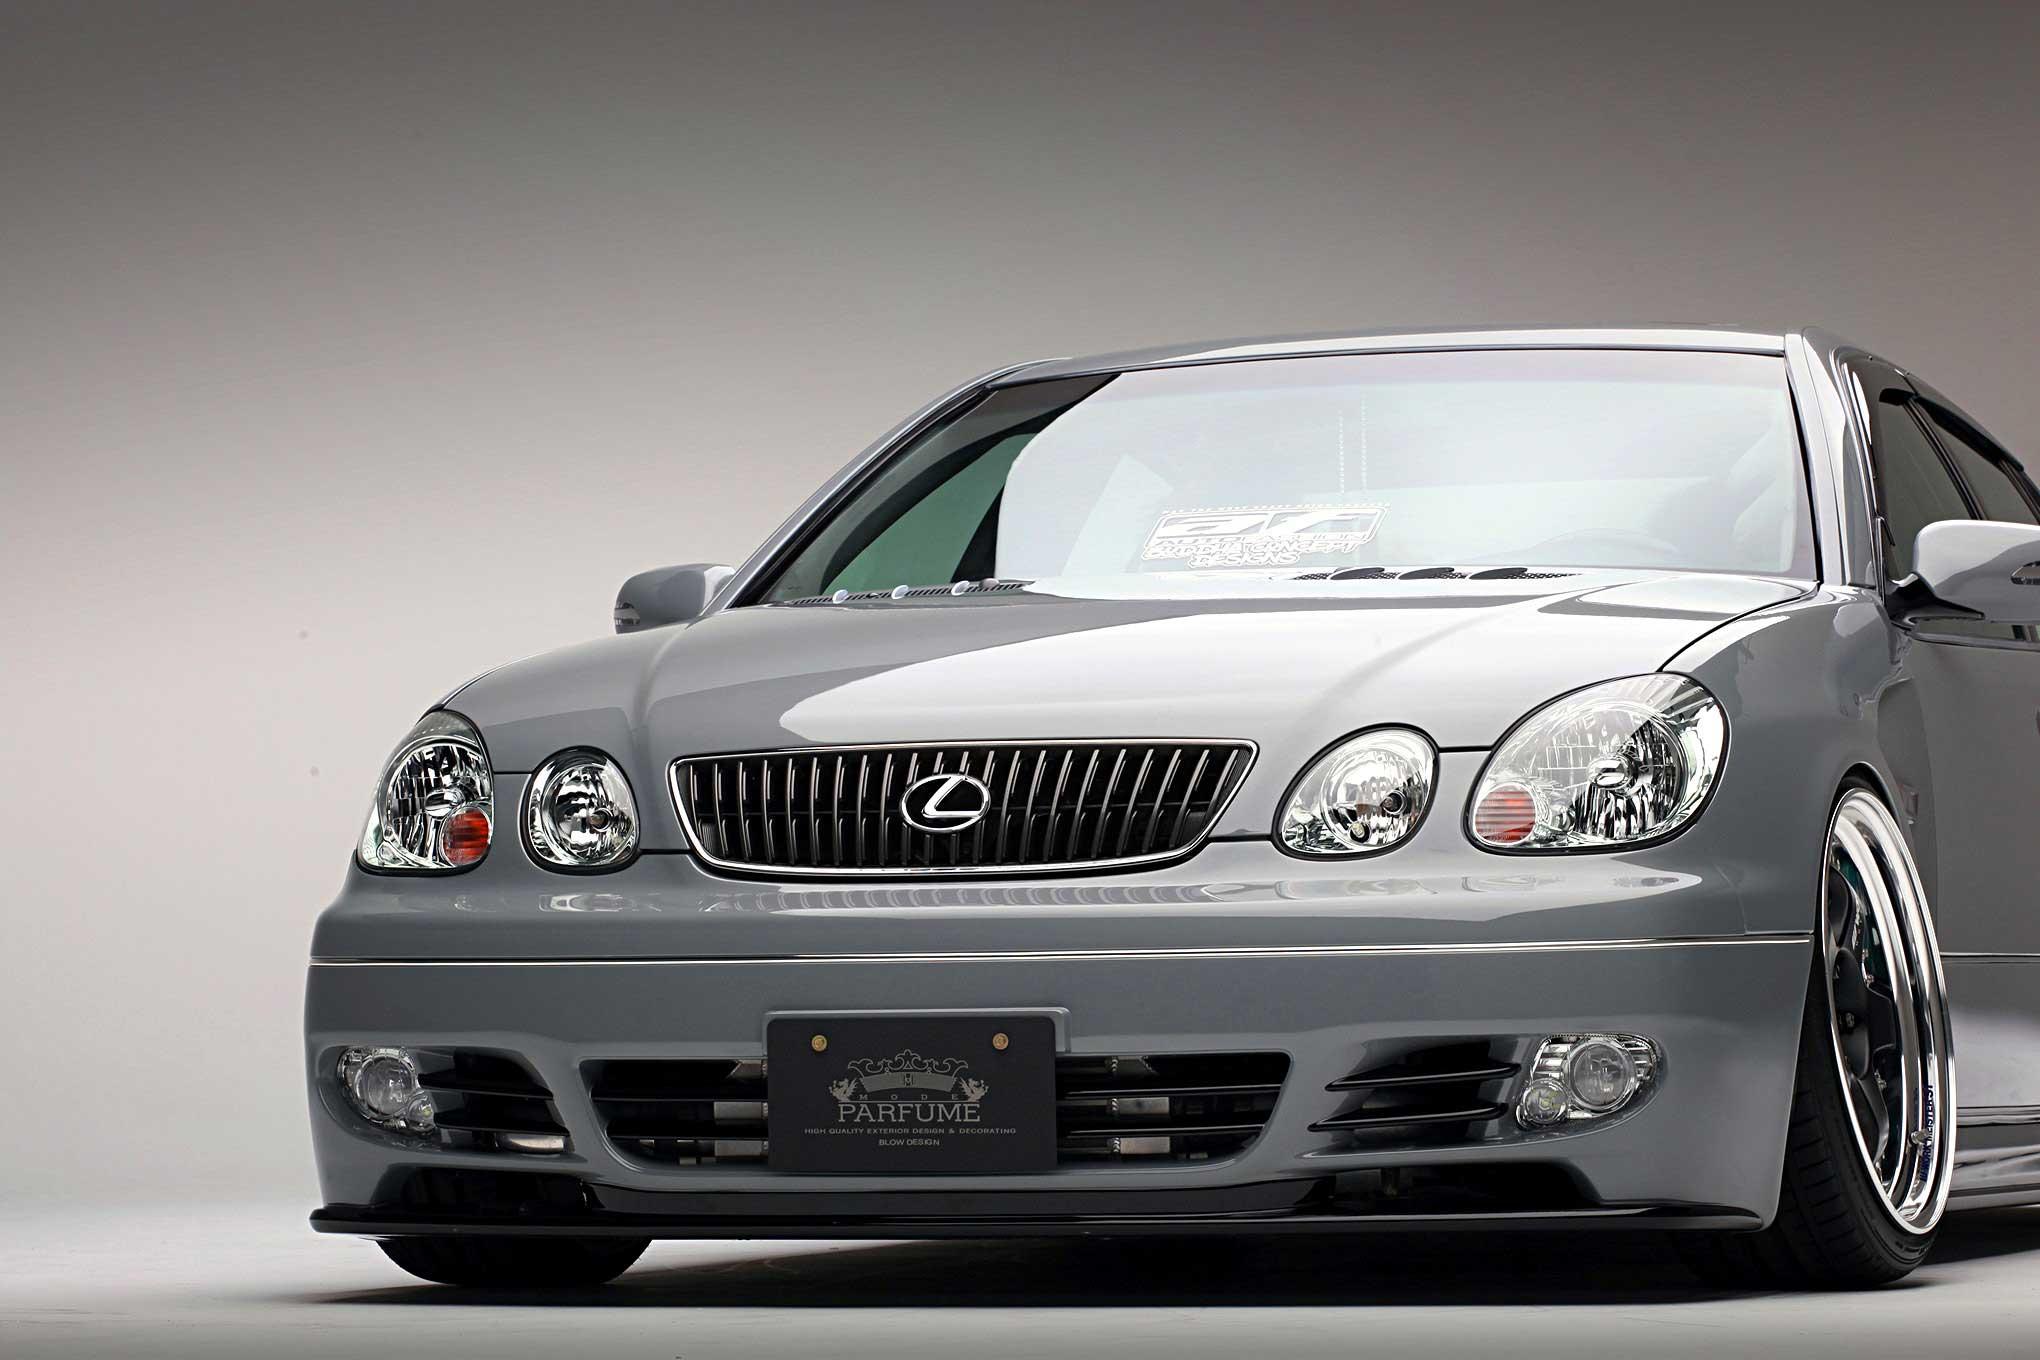 medium resolution of 1999 lexus gs300 mode parfume front bumper